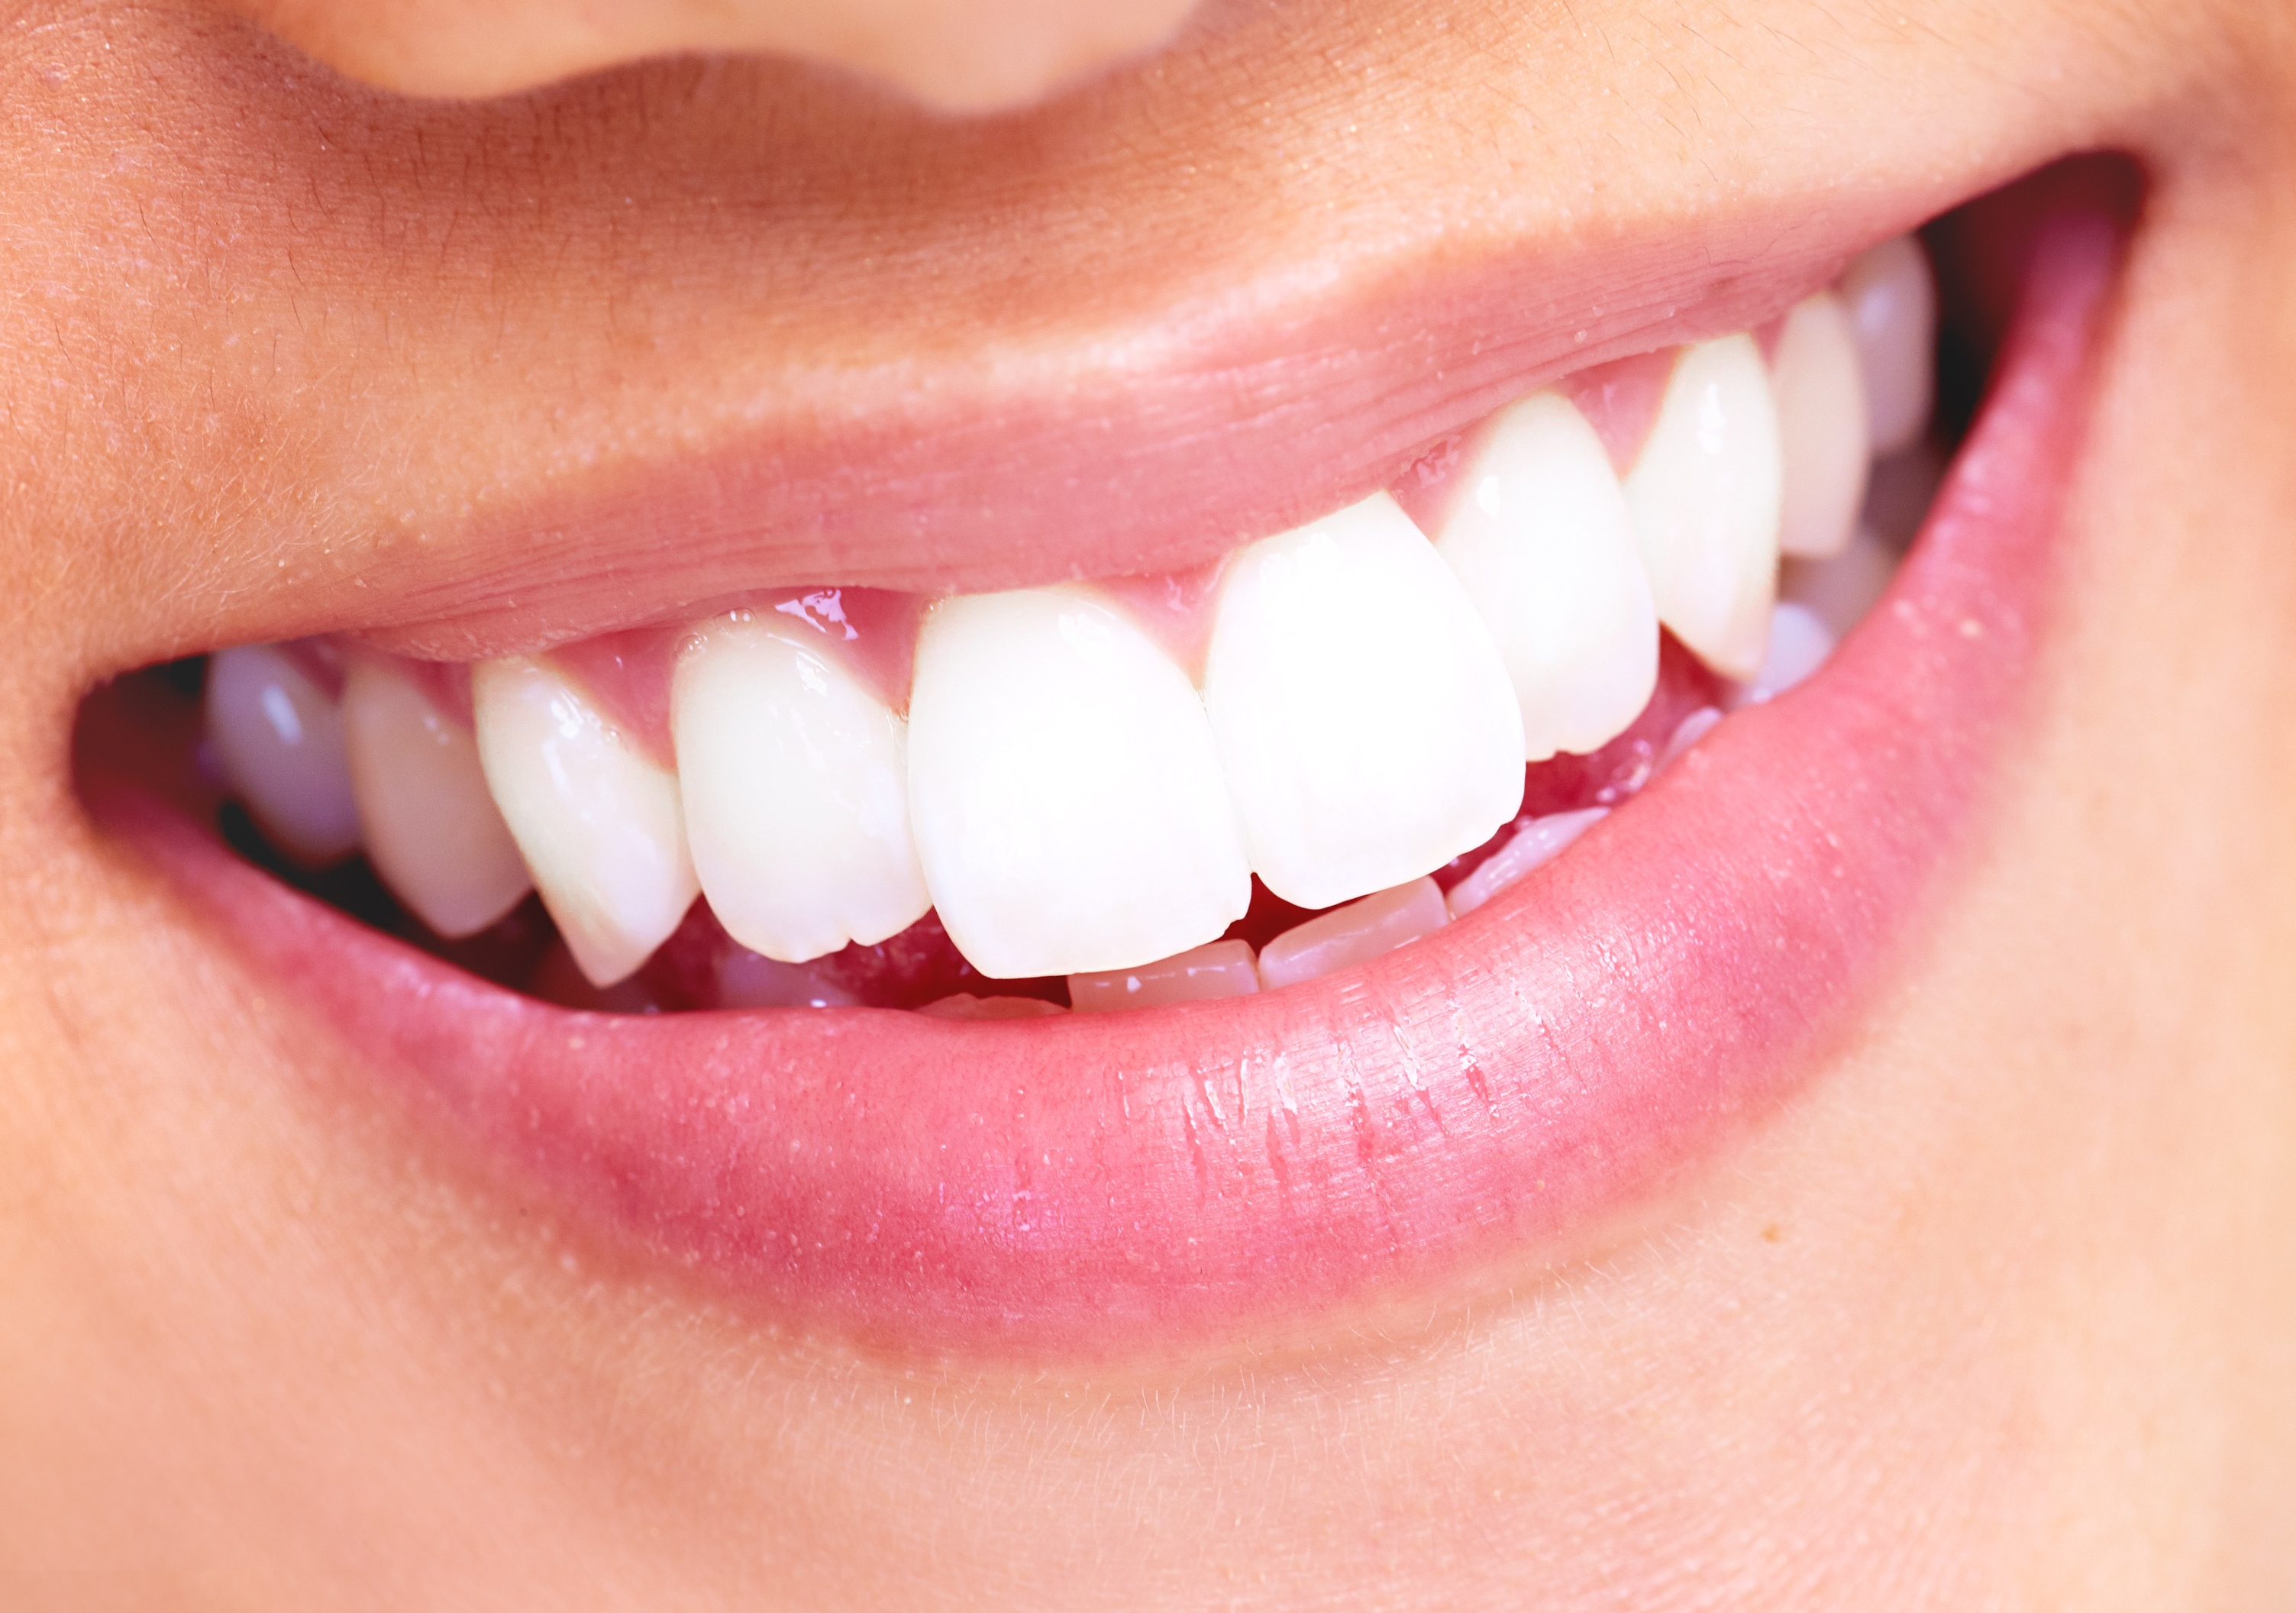 Gum Disease Lenox Hill